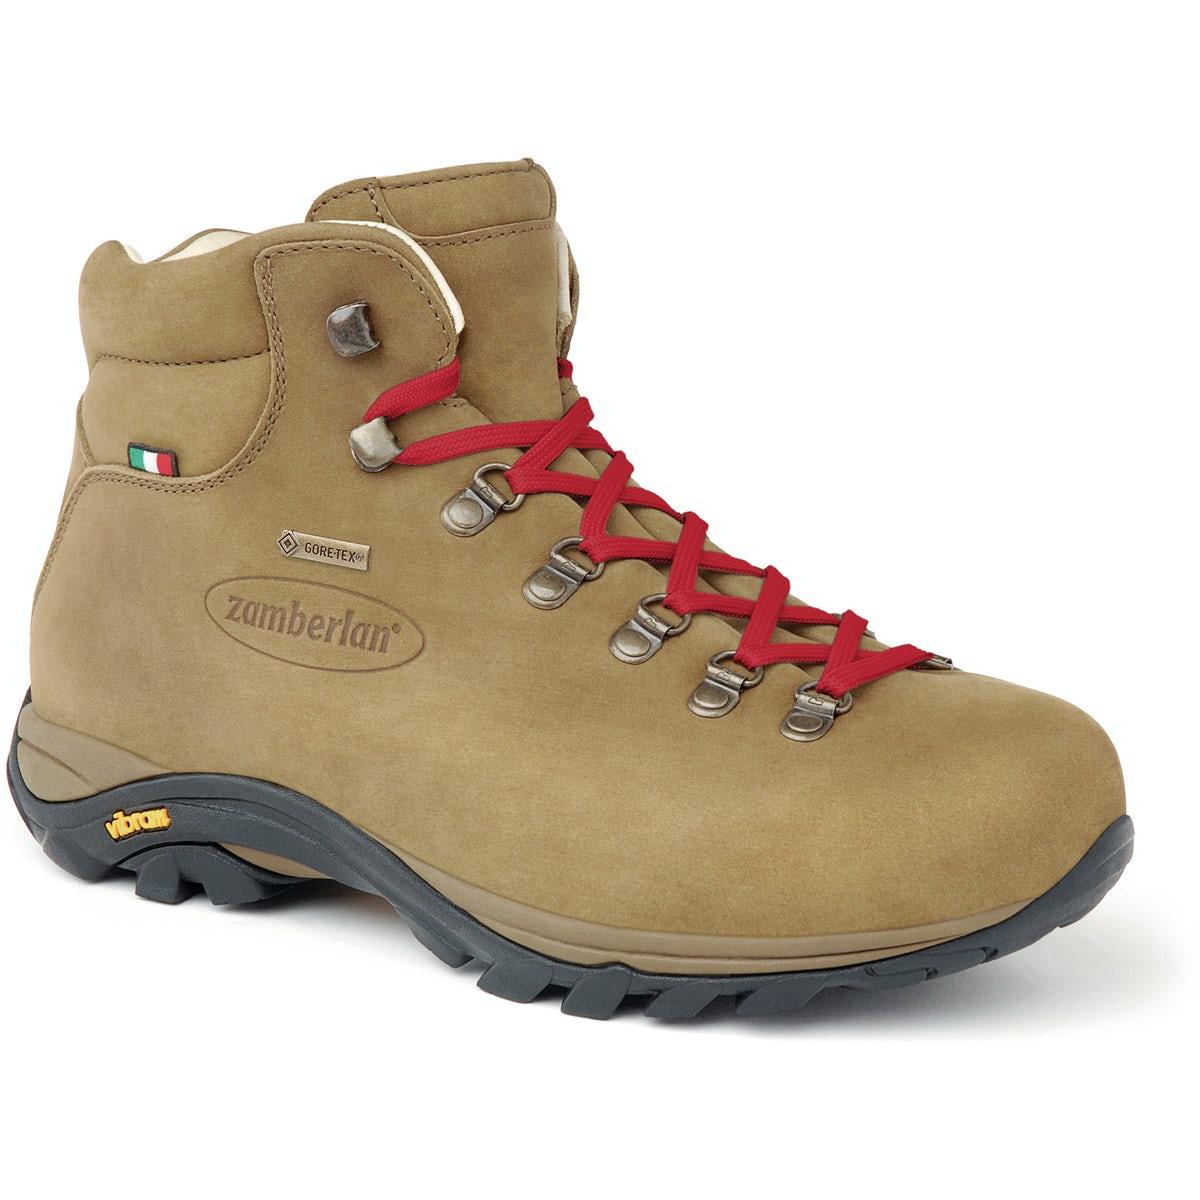 Zamberlan 320 Trail Lite Evo Gore-Tex Hiking Boots